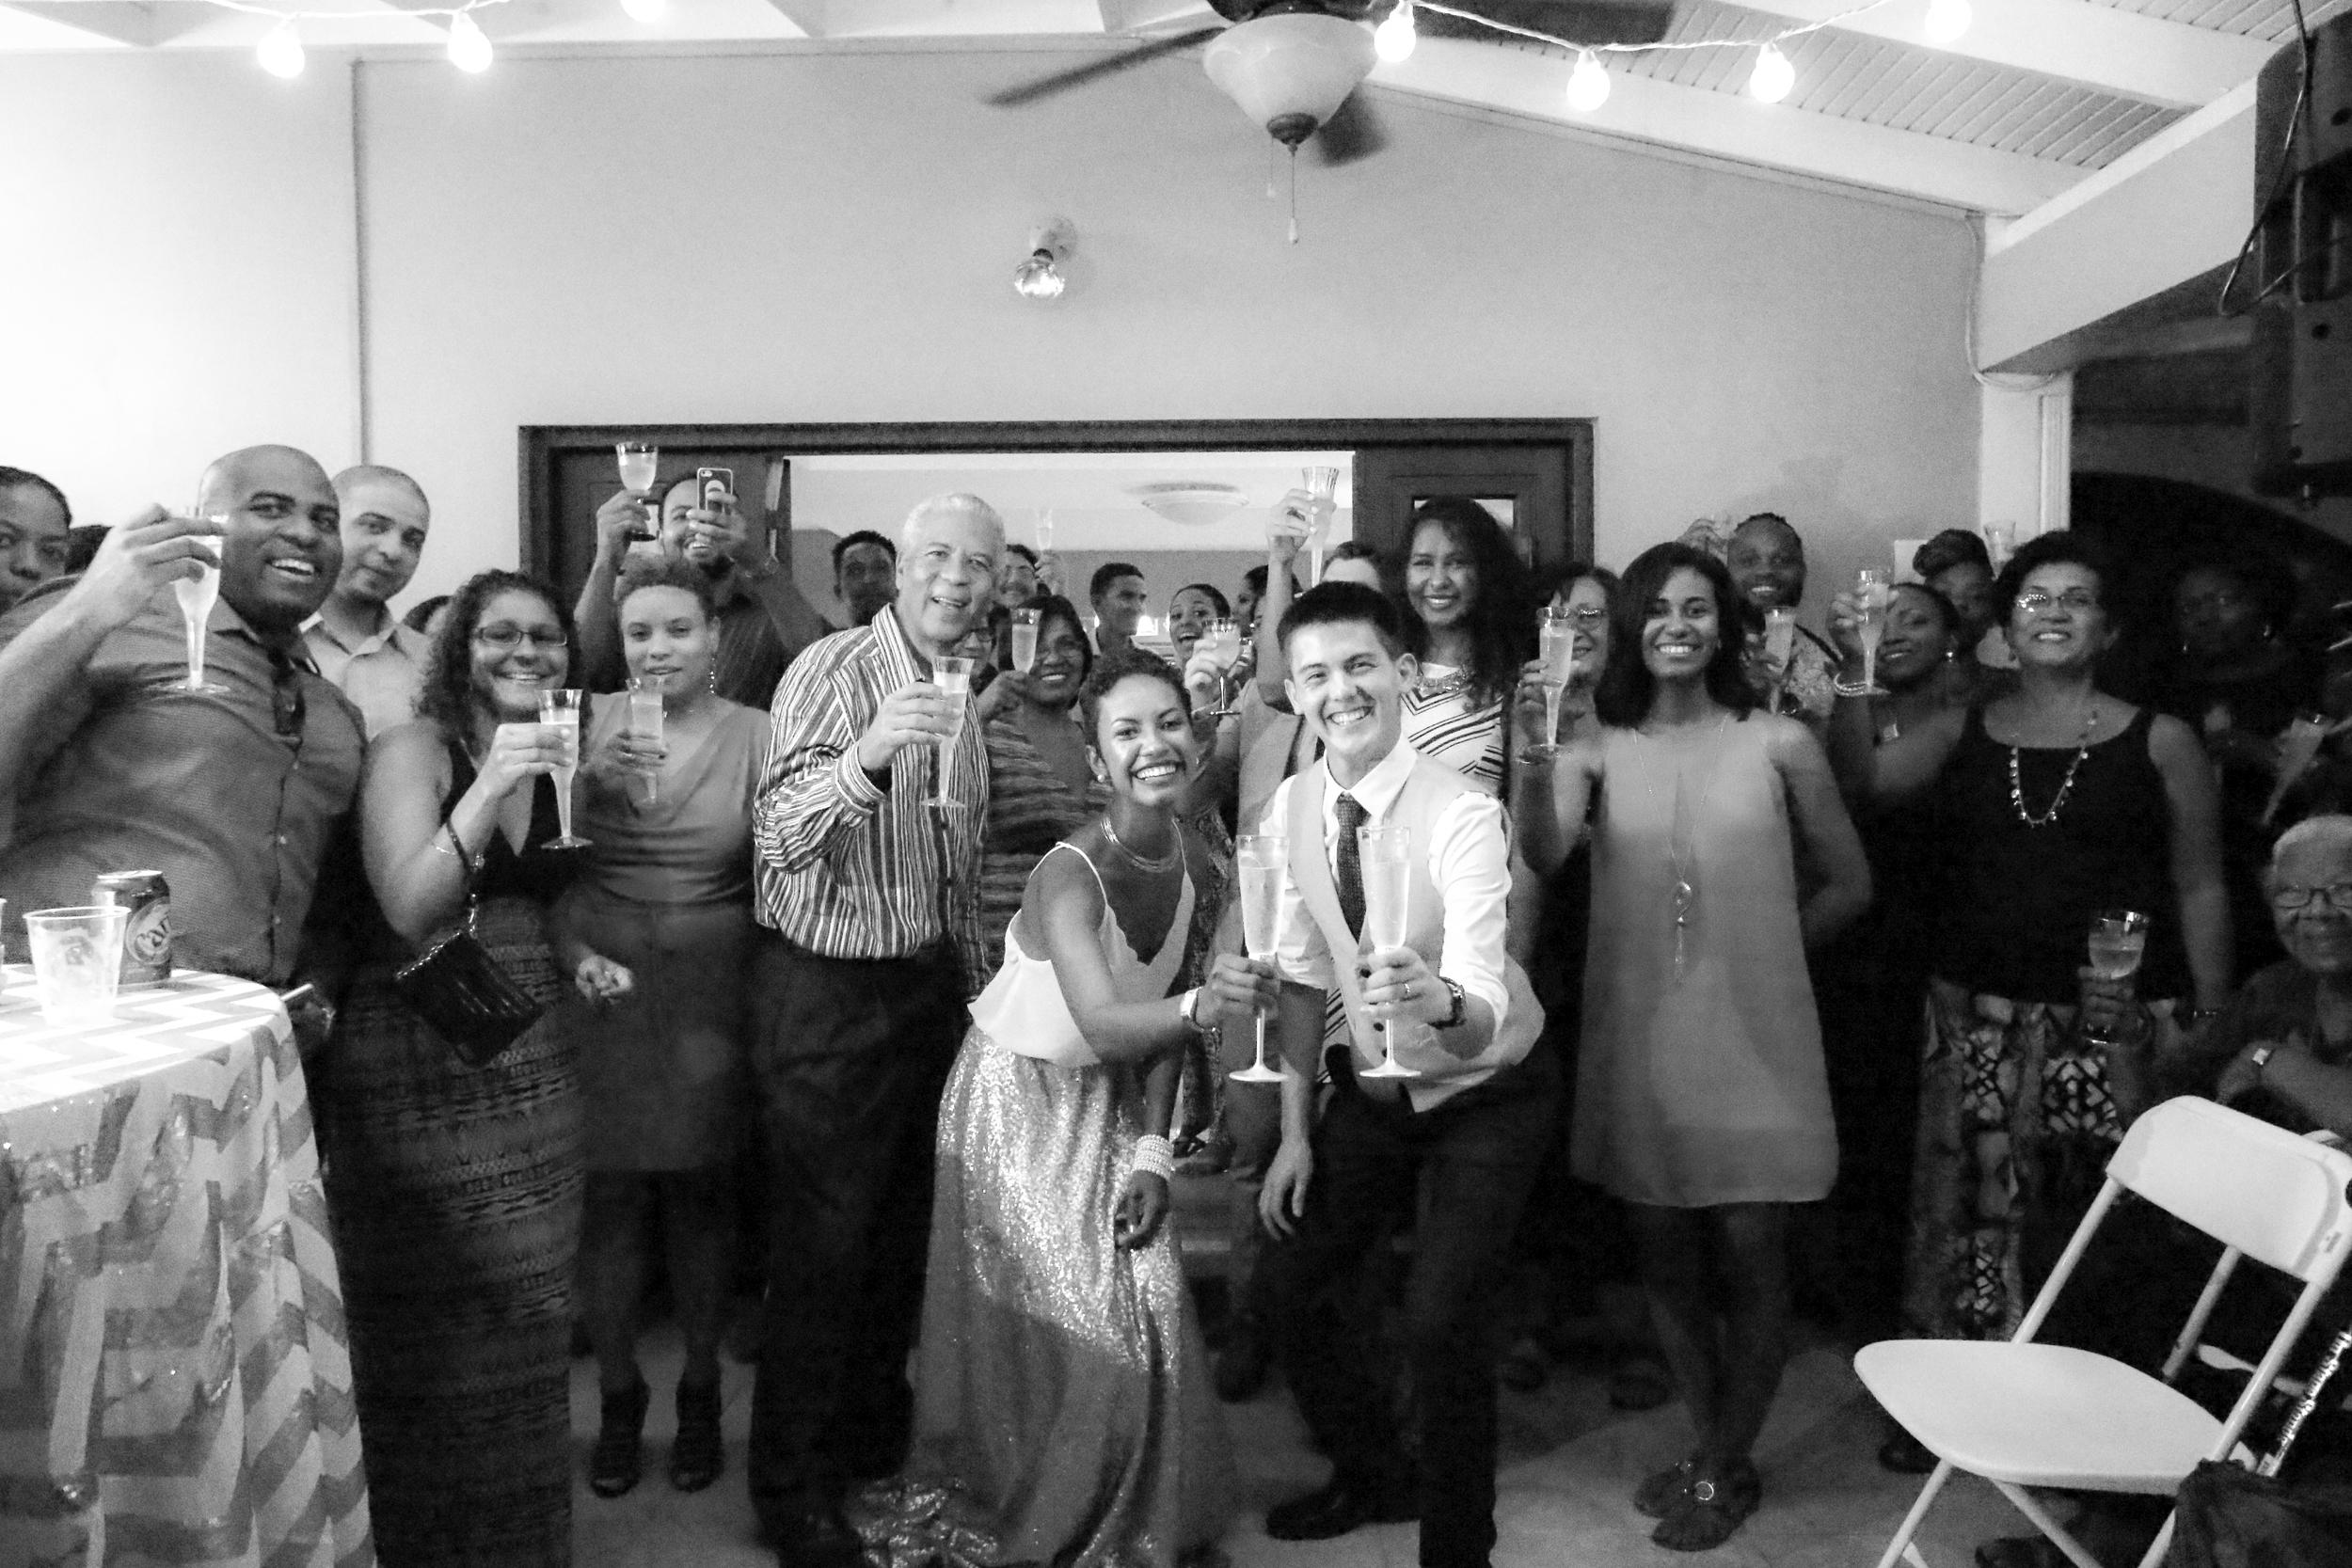 Corinnes Wedding Reception Wide Angles-6.jpg